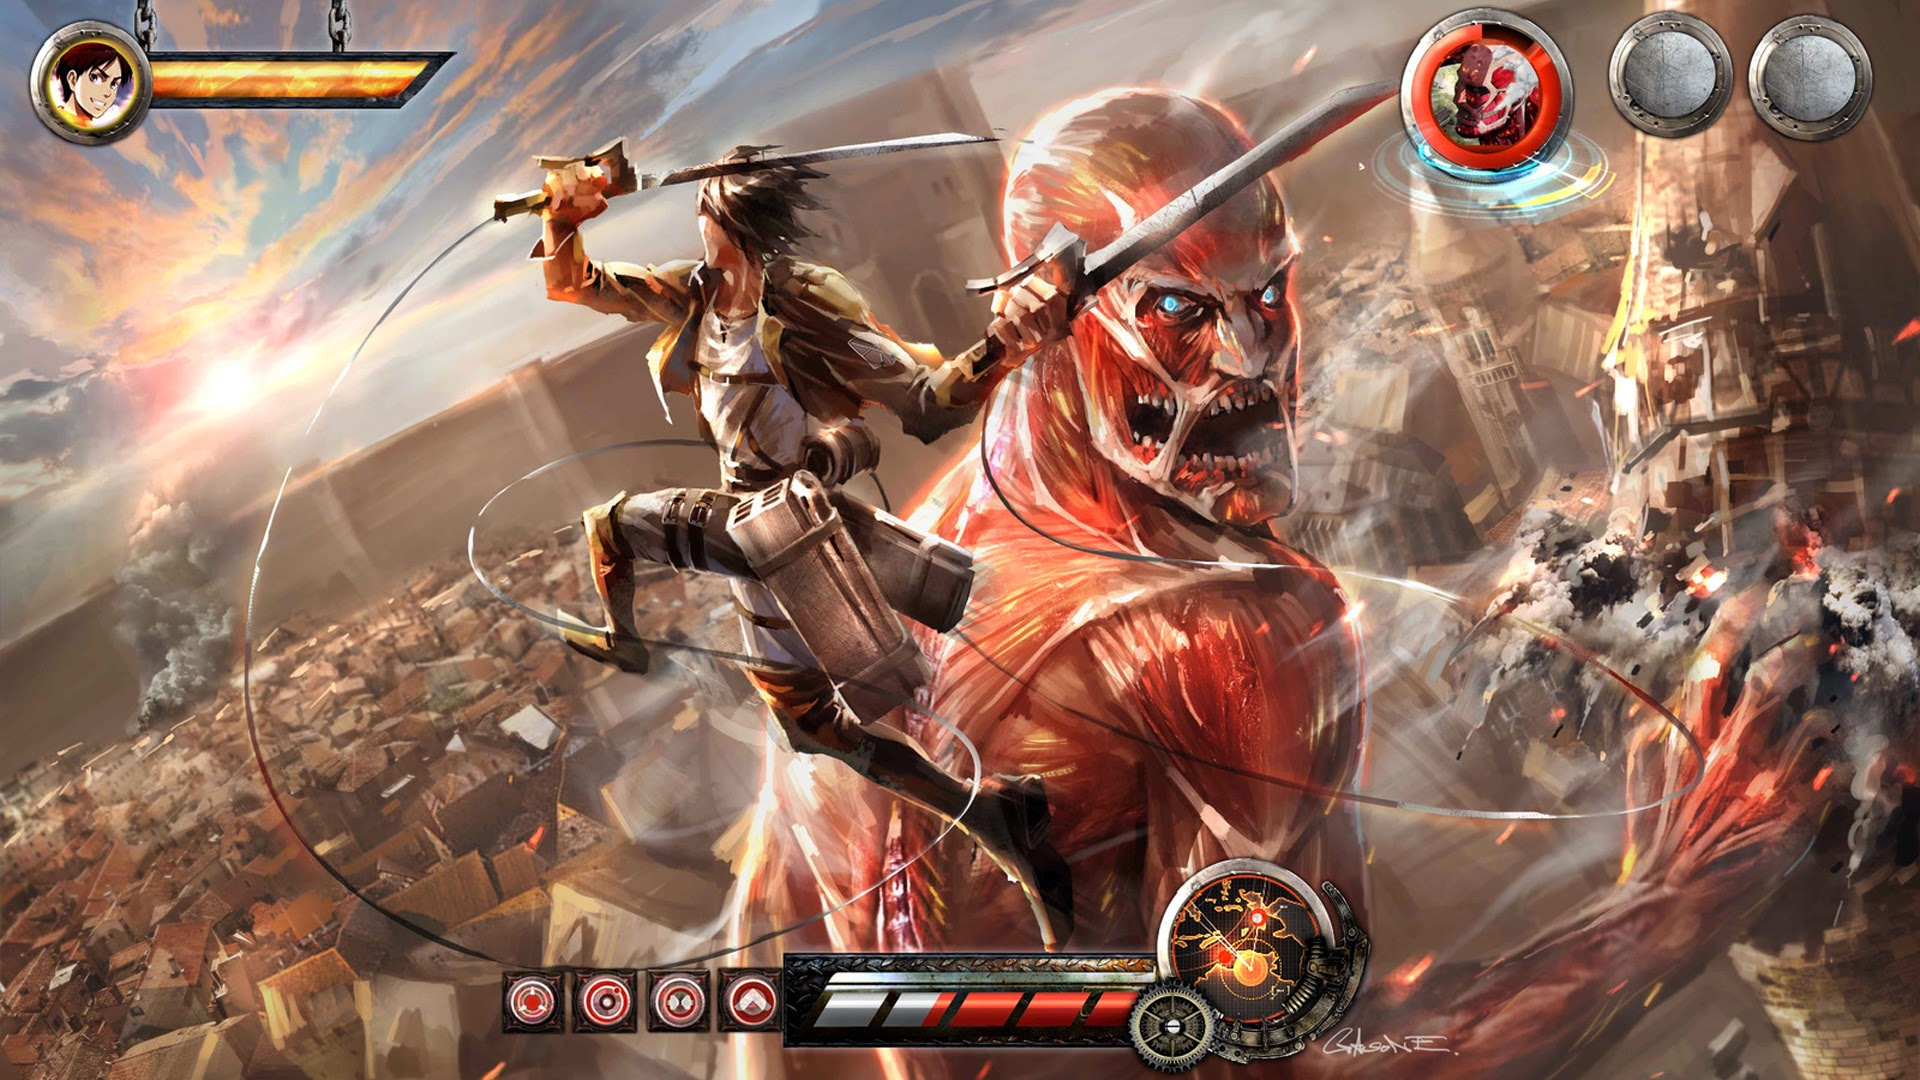 Free Download Titan Video Game Attack On Titan Shingeki No Kyojin